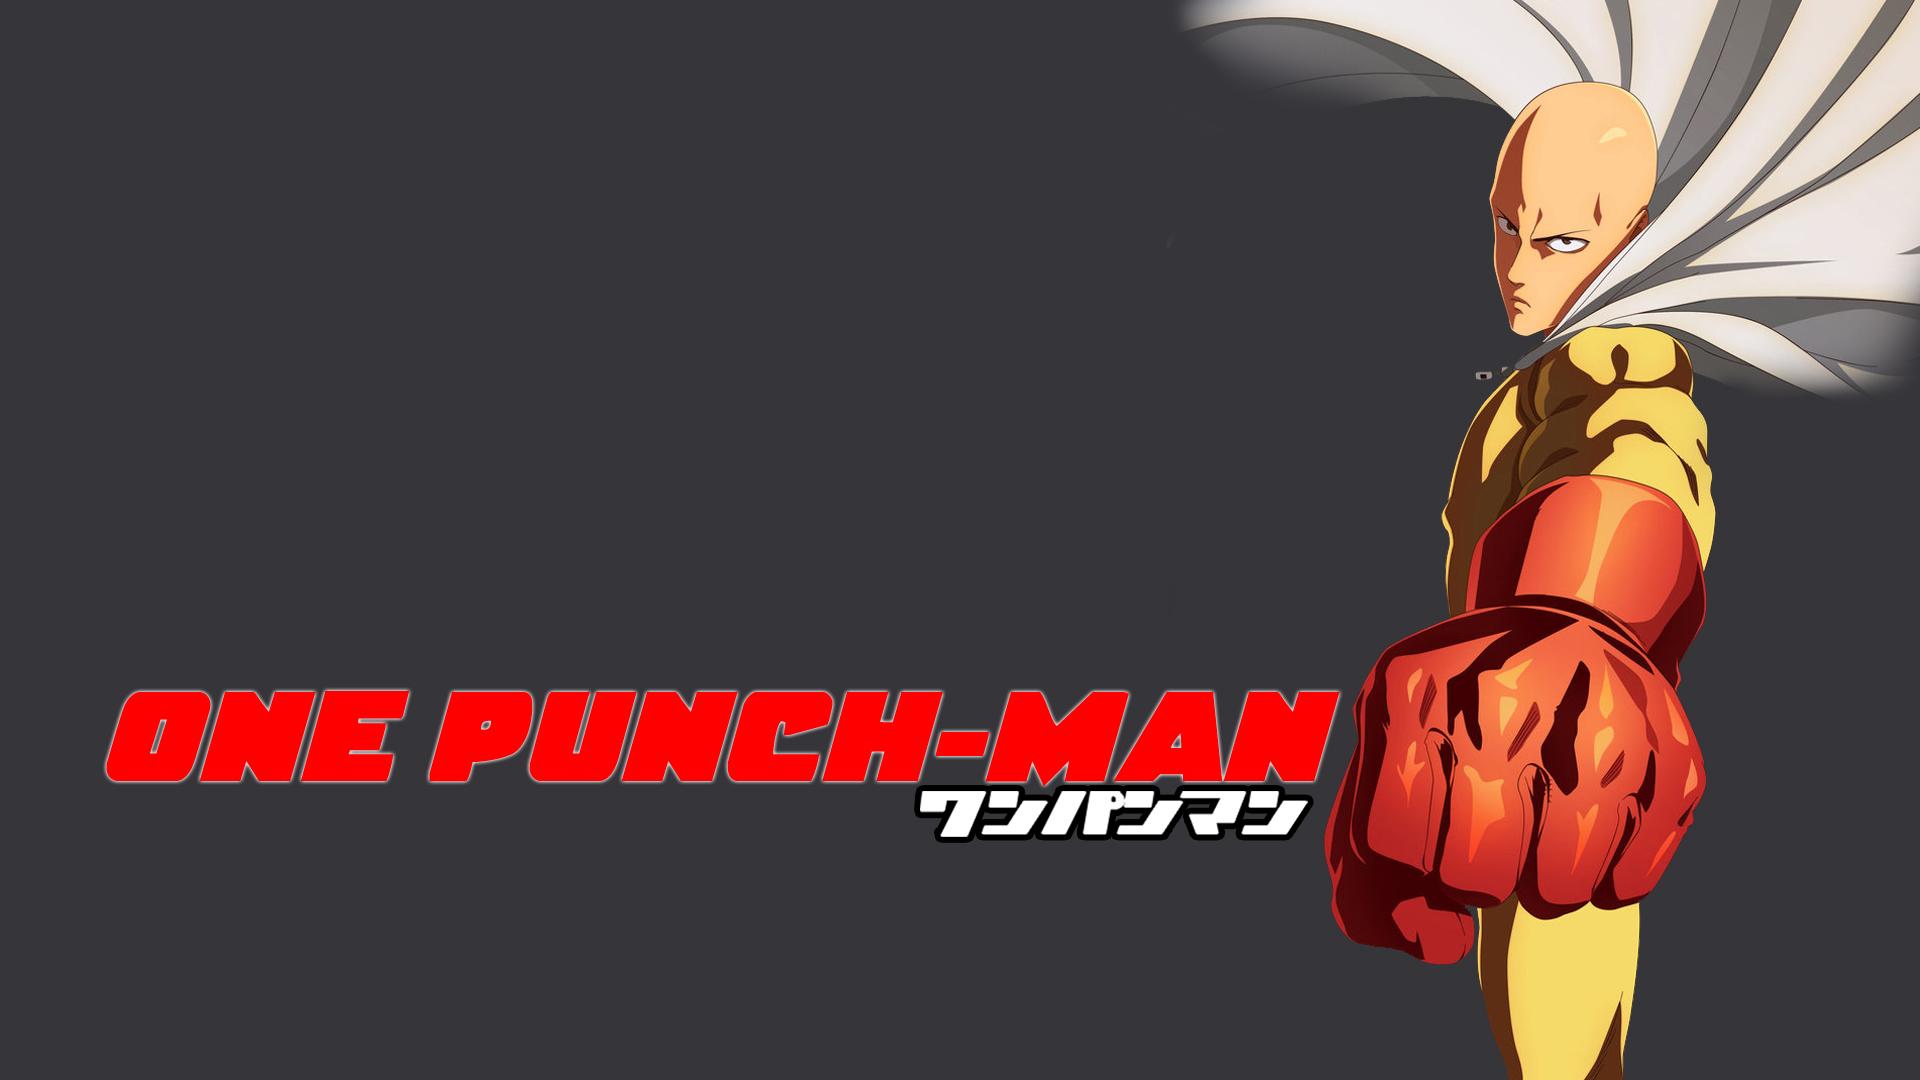 Аниме Ванпанчмен, One Punch Man - крутые обои на рабочий стол 7